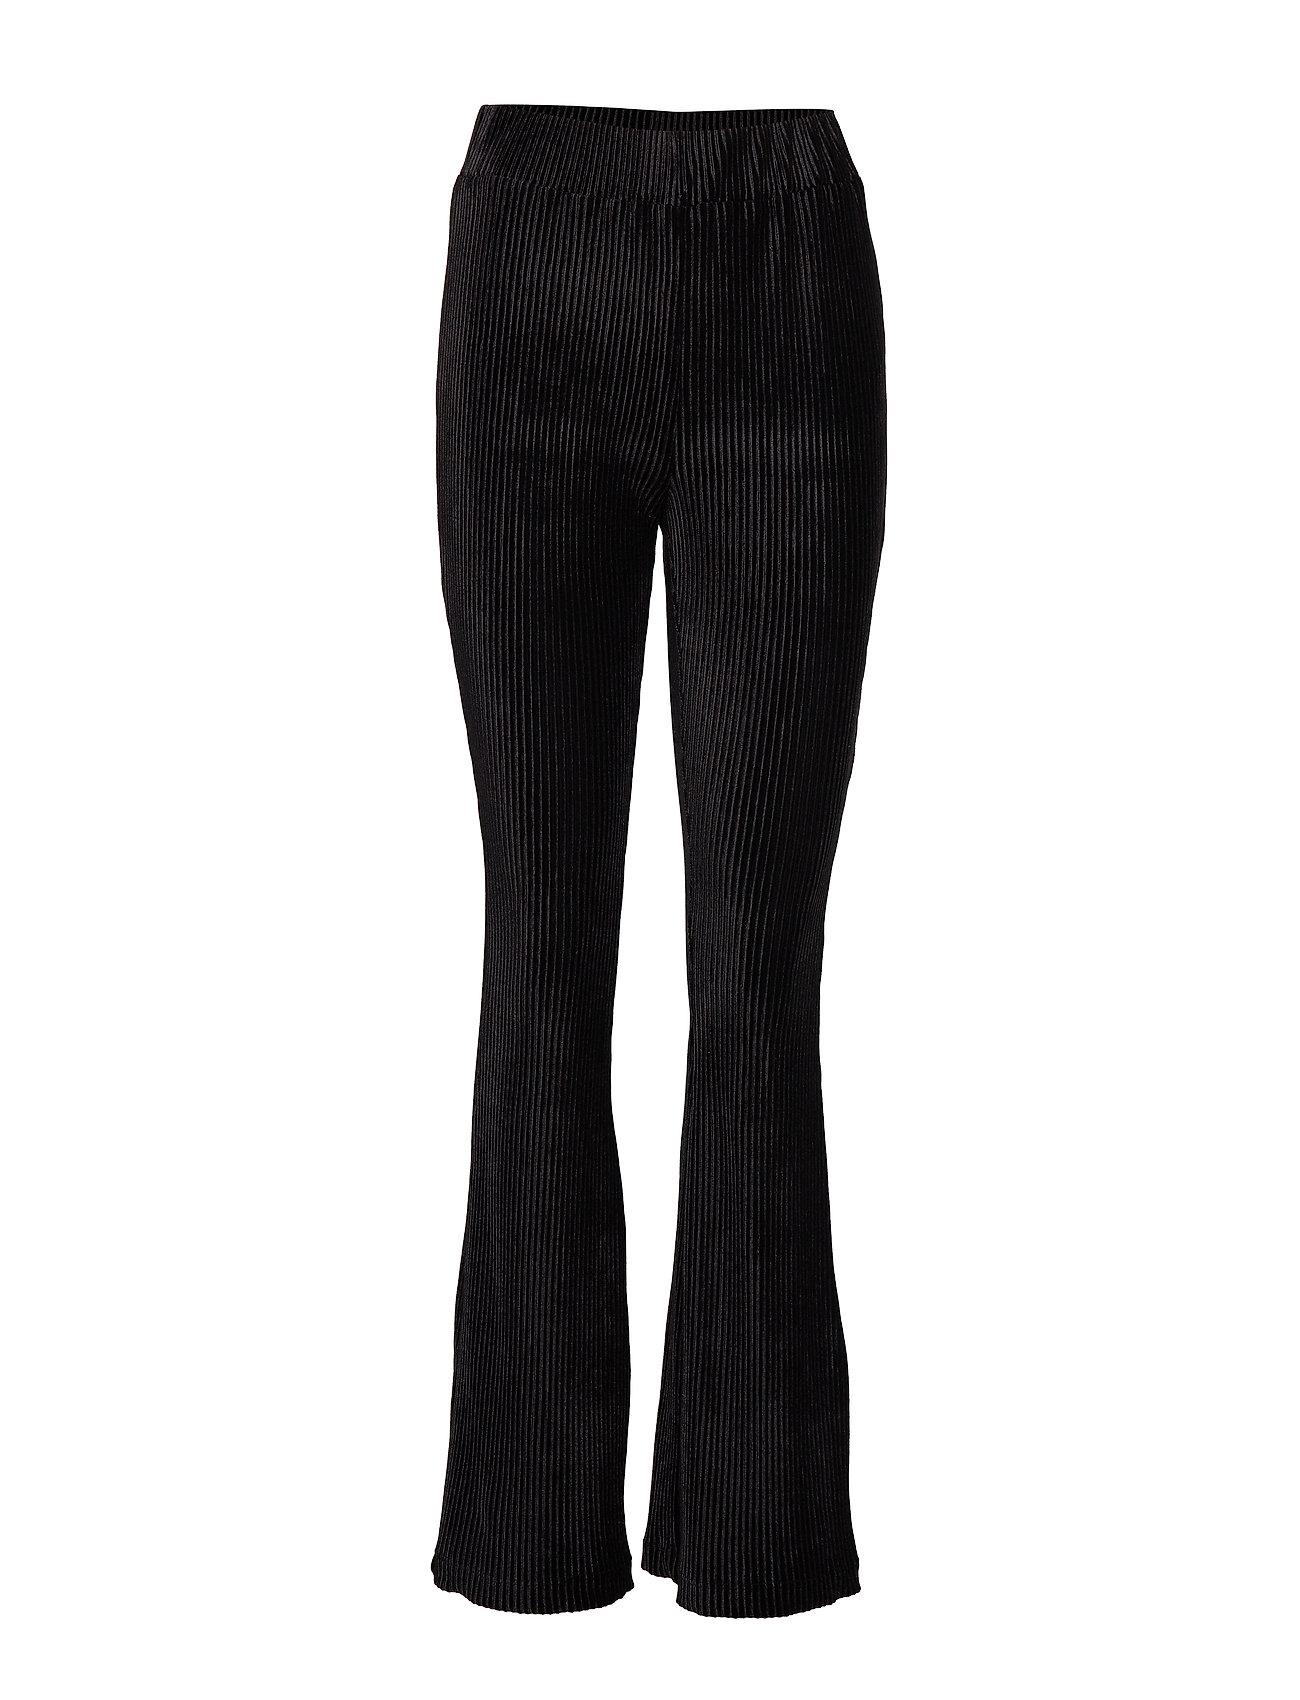 GUESS Jeans AMBER PANTS - JET BLACK A996